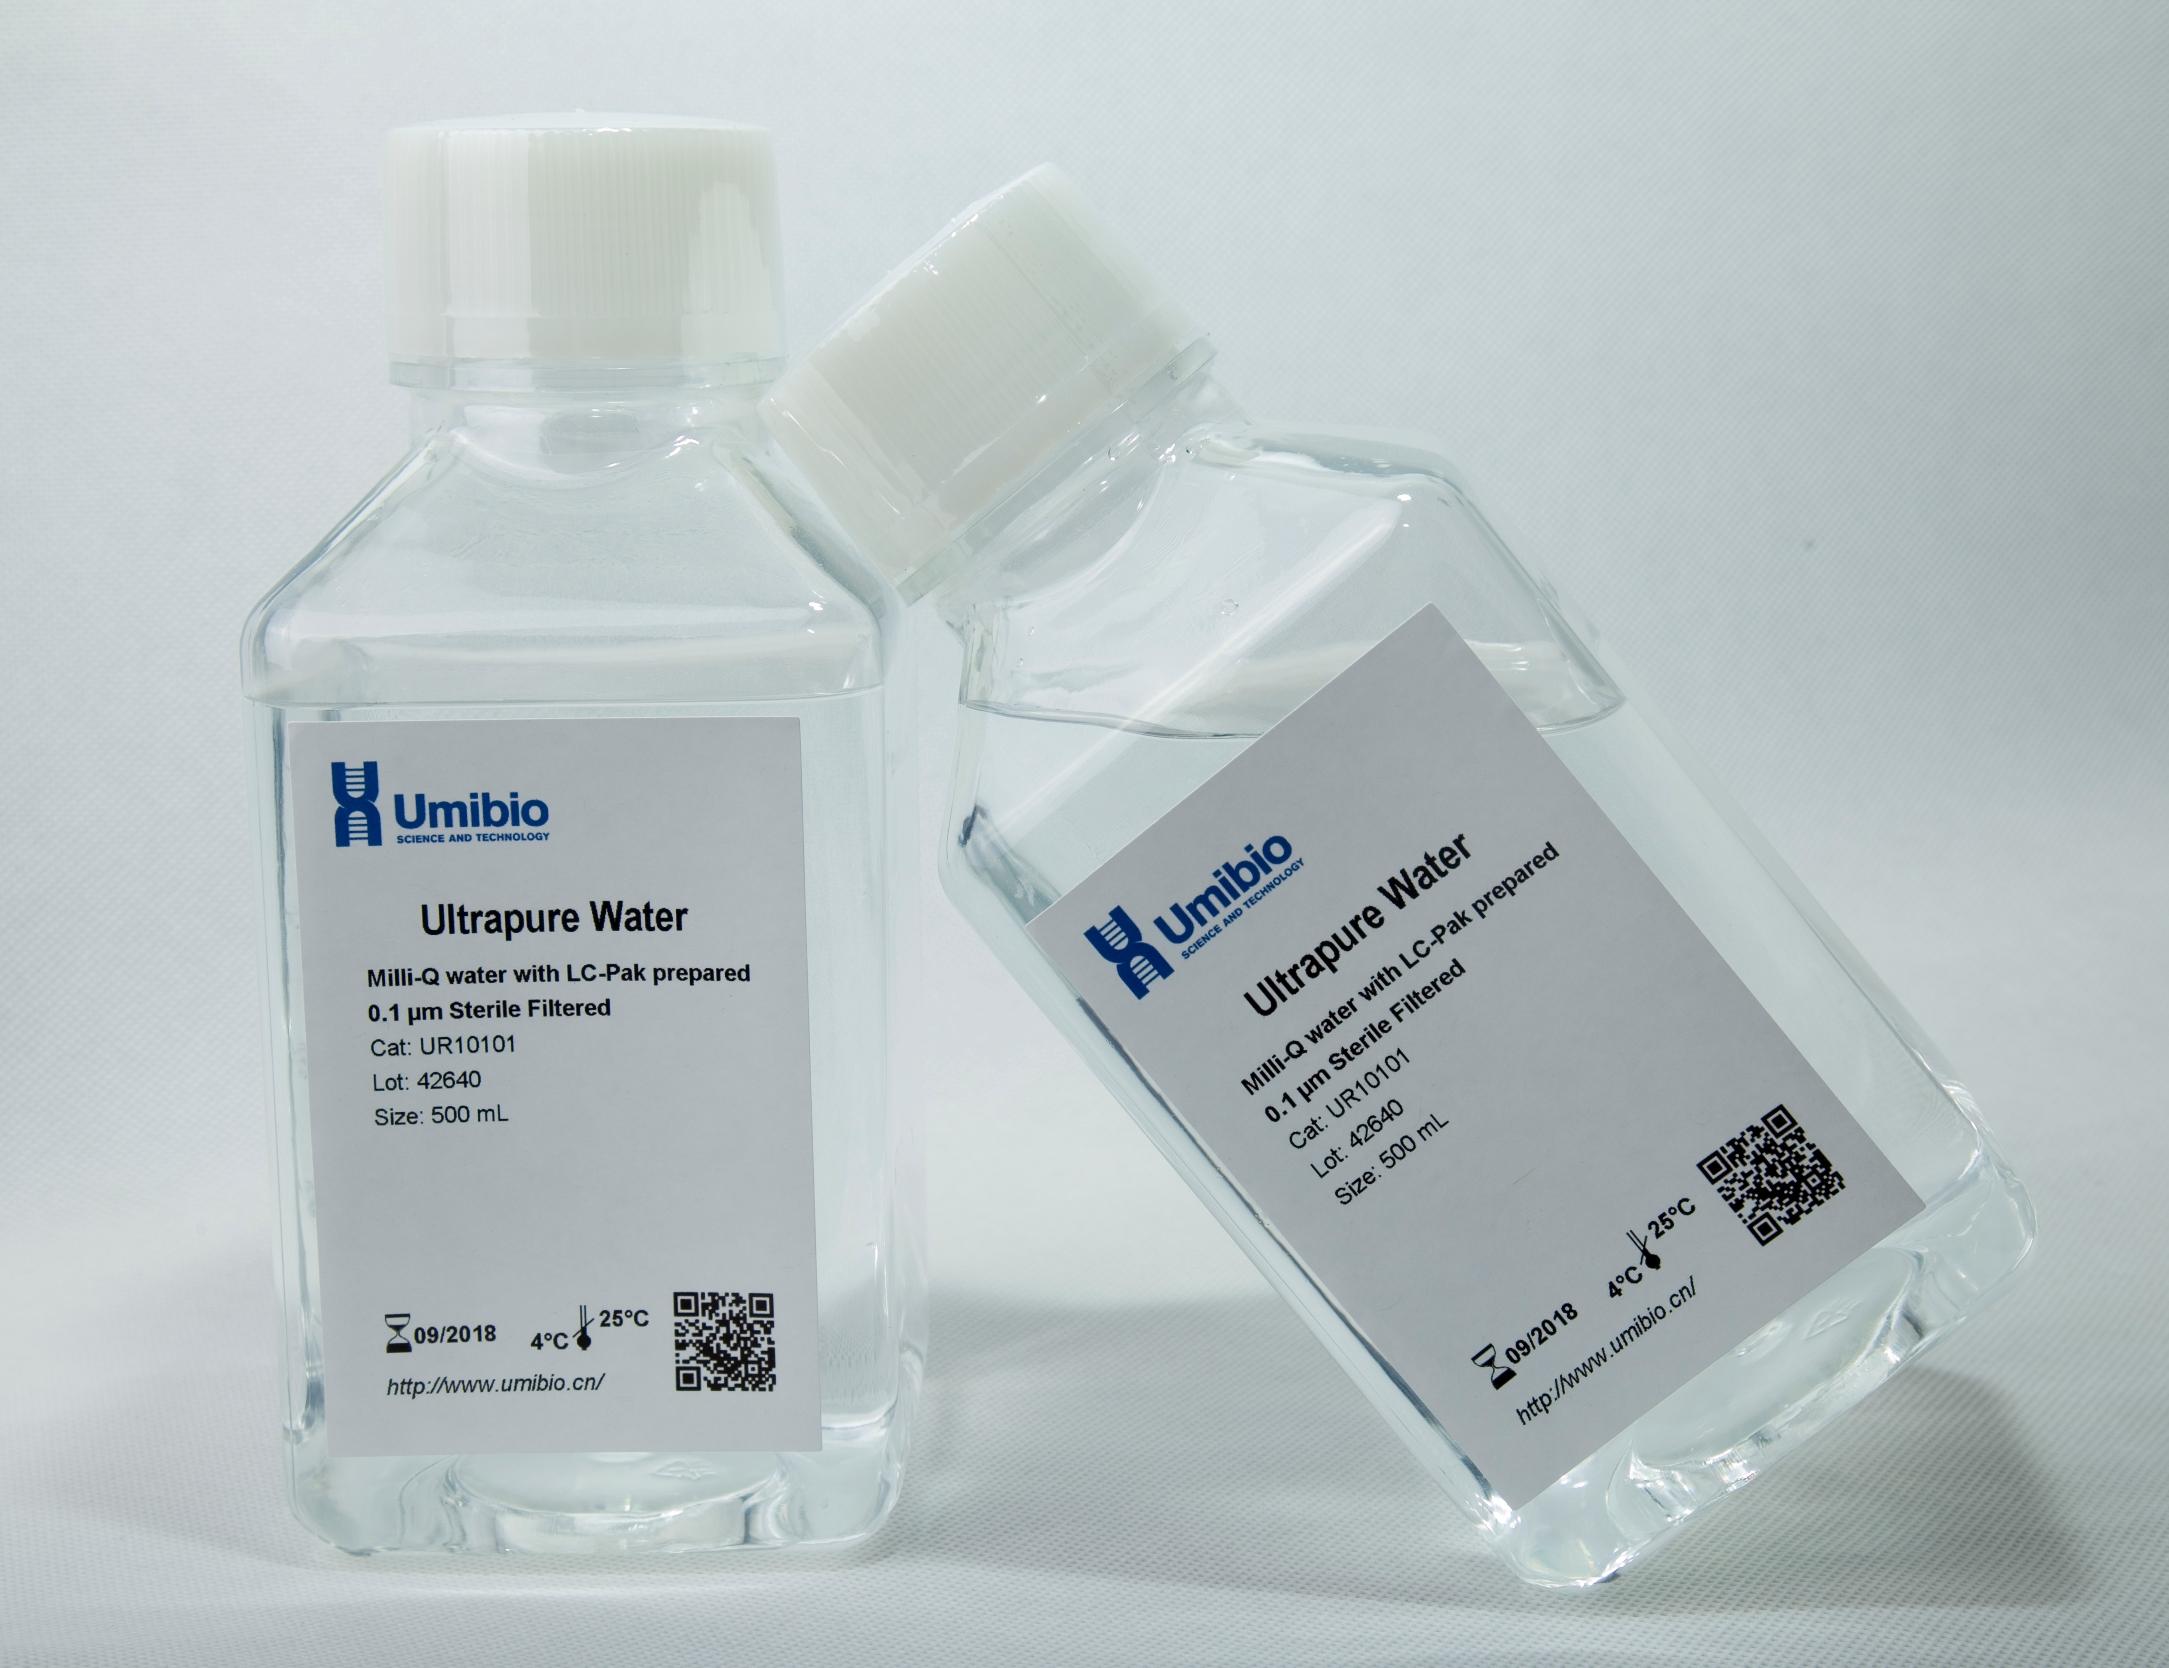 Umibio 缓冲液系列产品